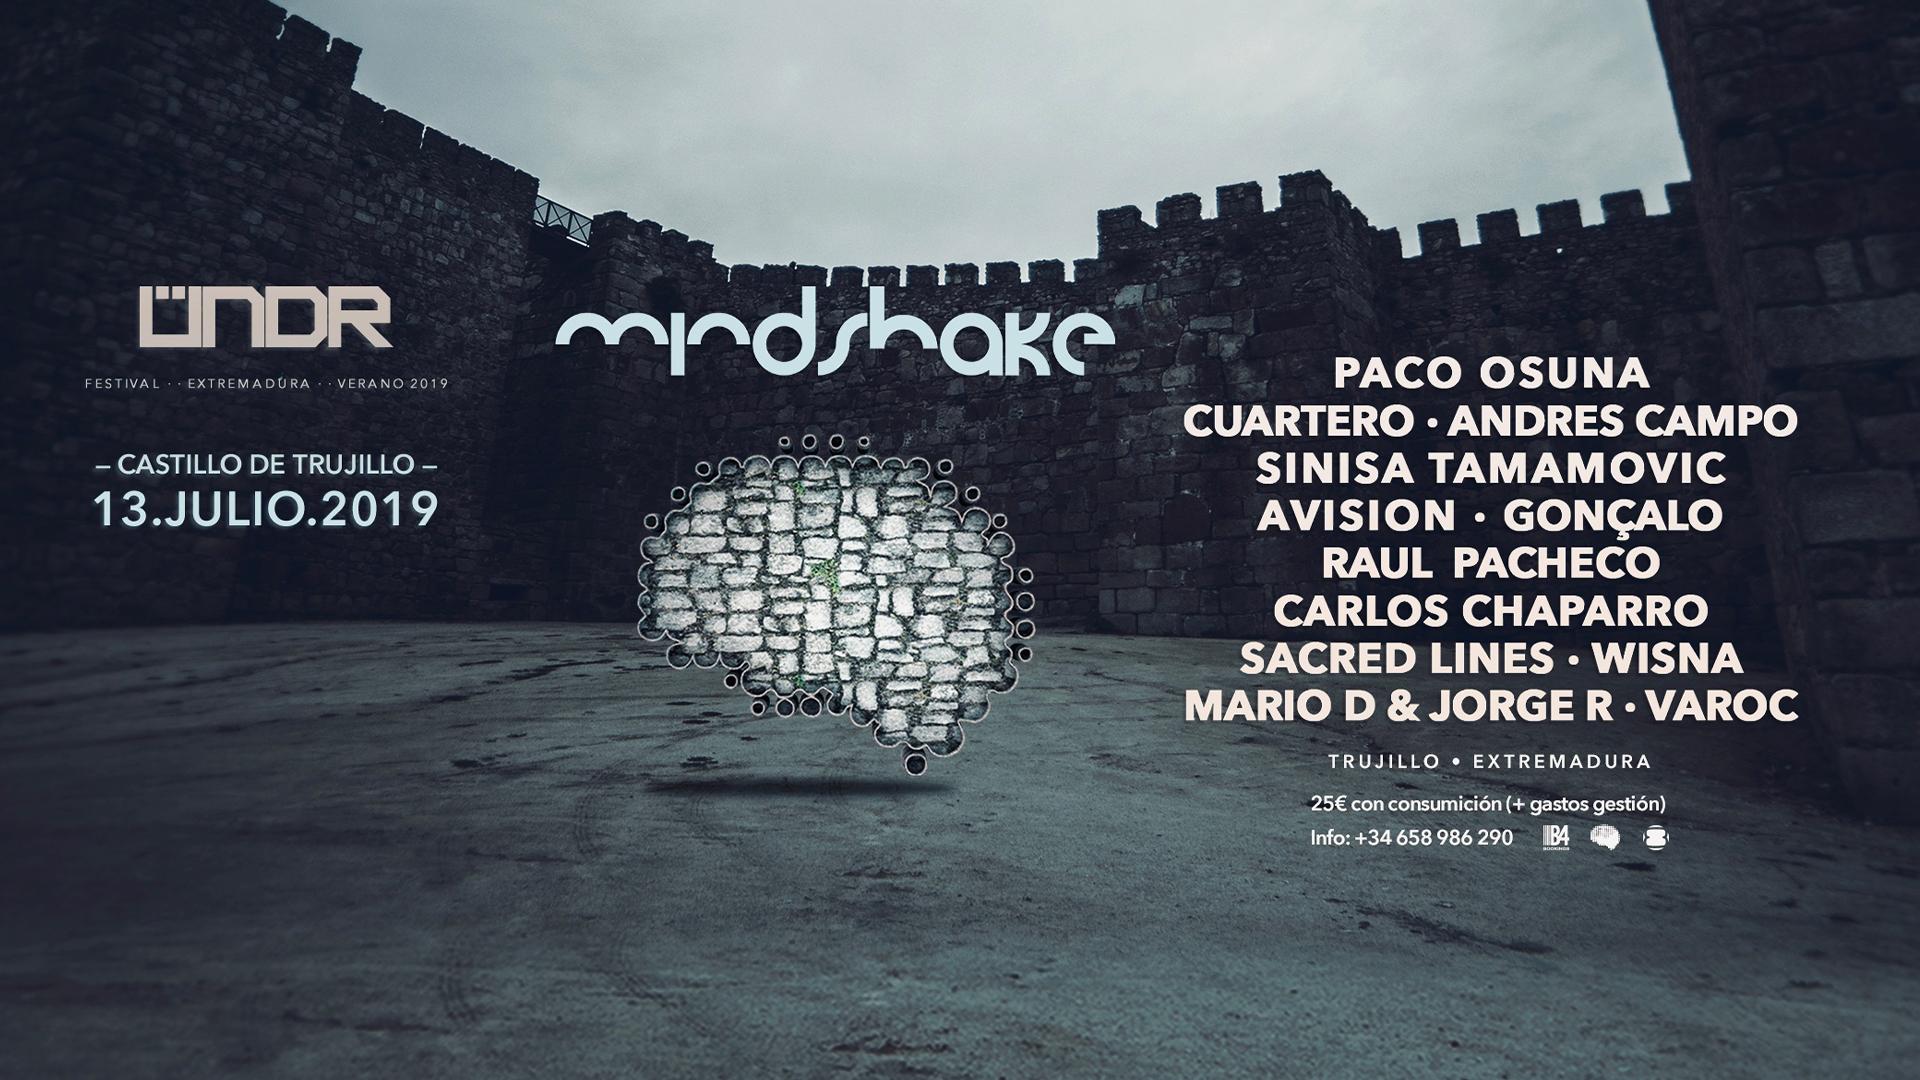 FB-Evento_Mindshake-@-Under.jpg